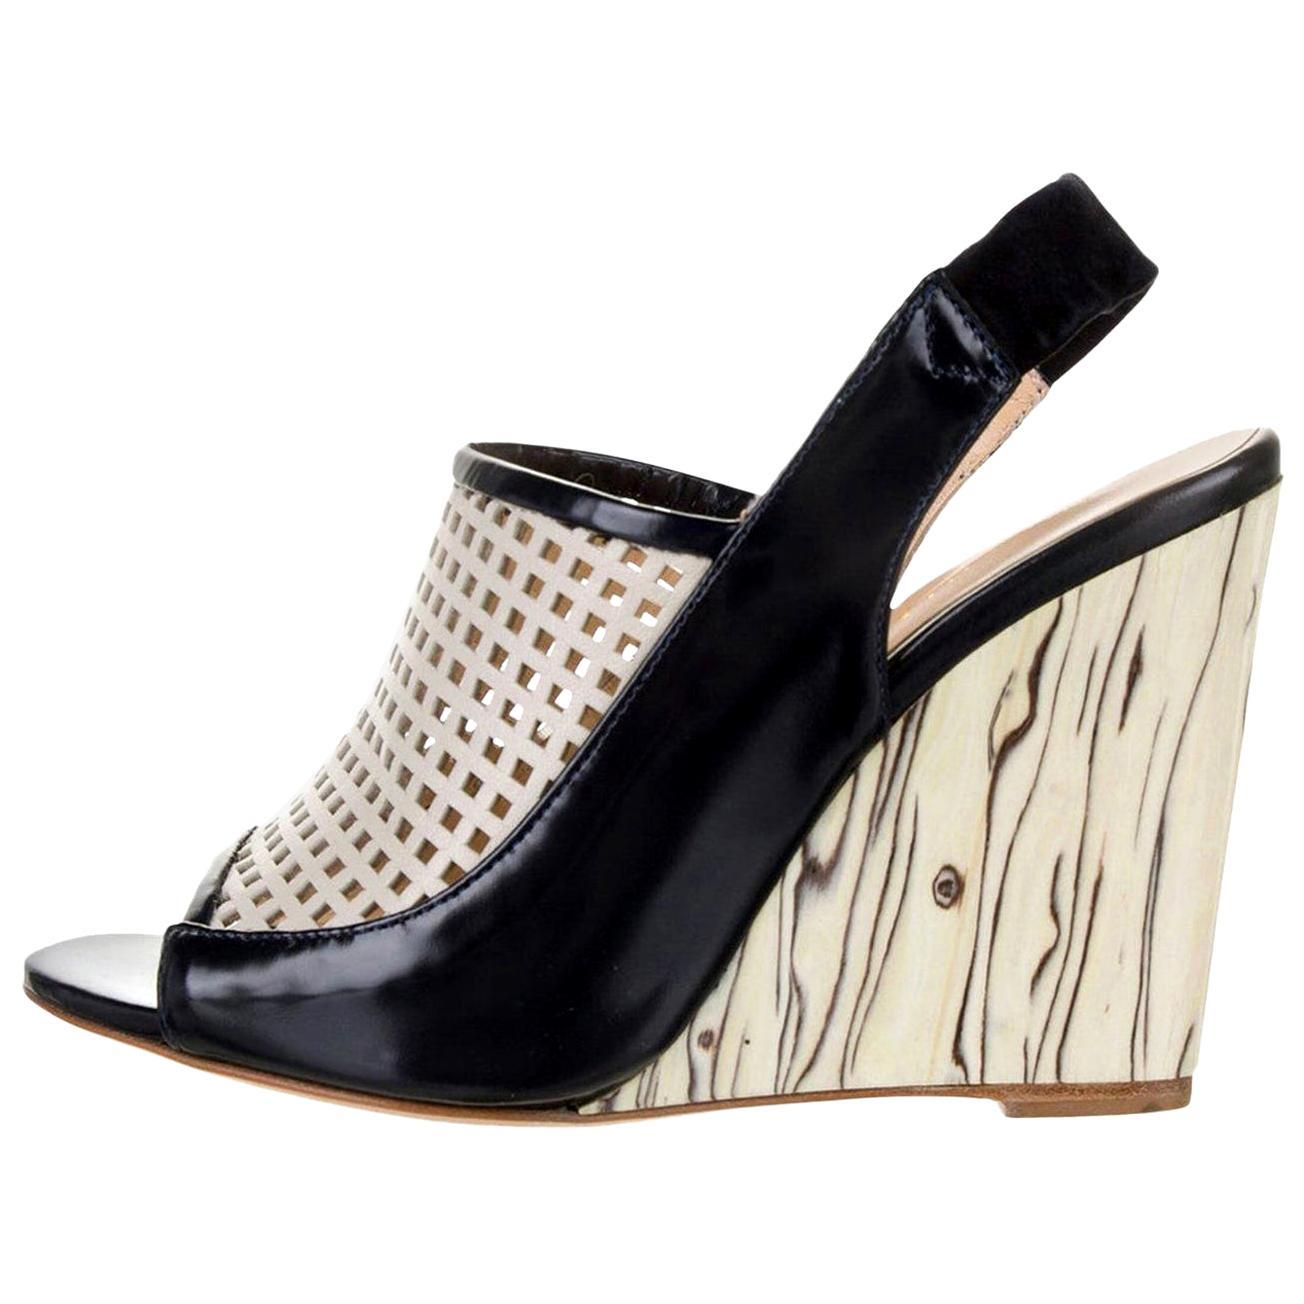 New Eugenia Kim Leather Wedge Heels Sz 39  U.S. 8.5